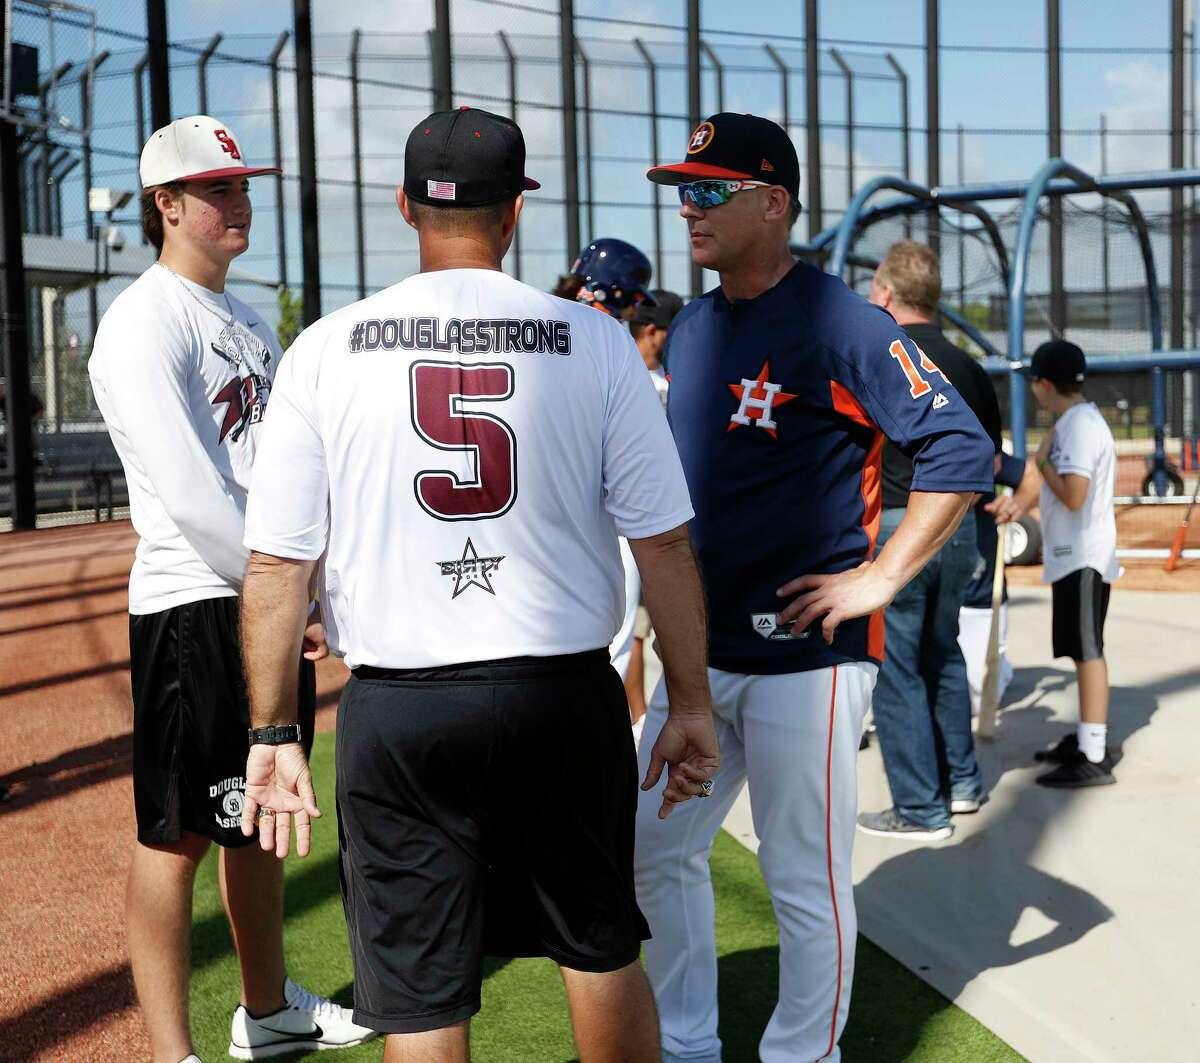 Houston Astros manager A.J. Hinch talks with Douglas Stoneman High School's baseball head coach Todd Fitz-Gerald, center, and his son, Hunter Fitz-Gerald, left, during baseball spring training in West Palm Beach, Fla., Friday, Feb. 23, 2018. (Karen Warren/Houston Chronicle via AP)